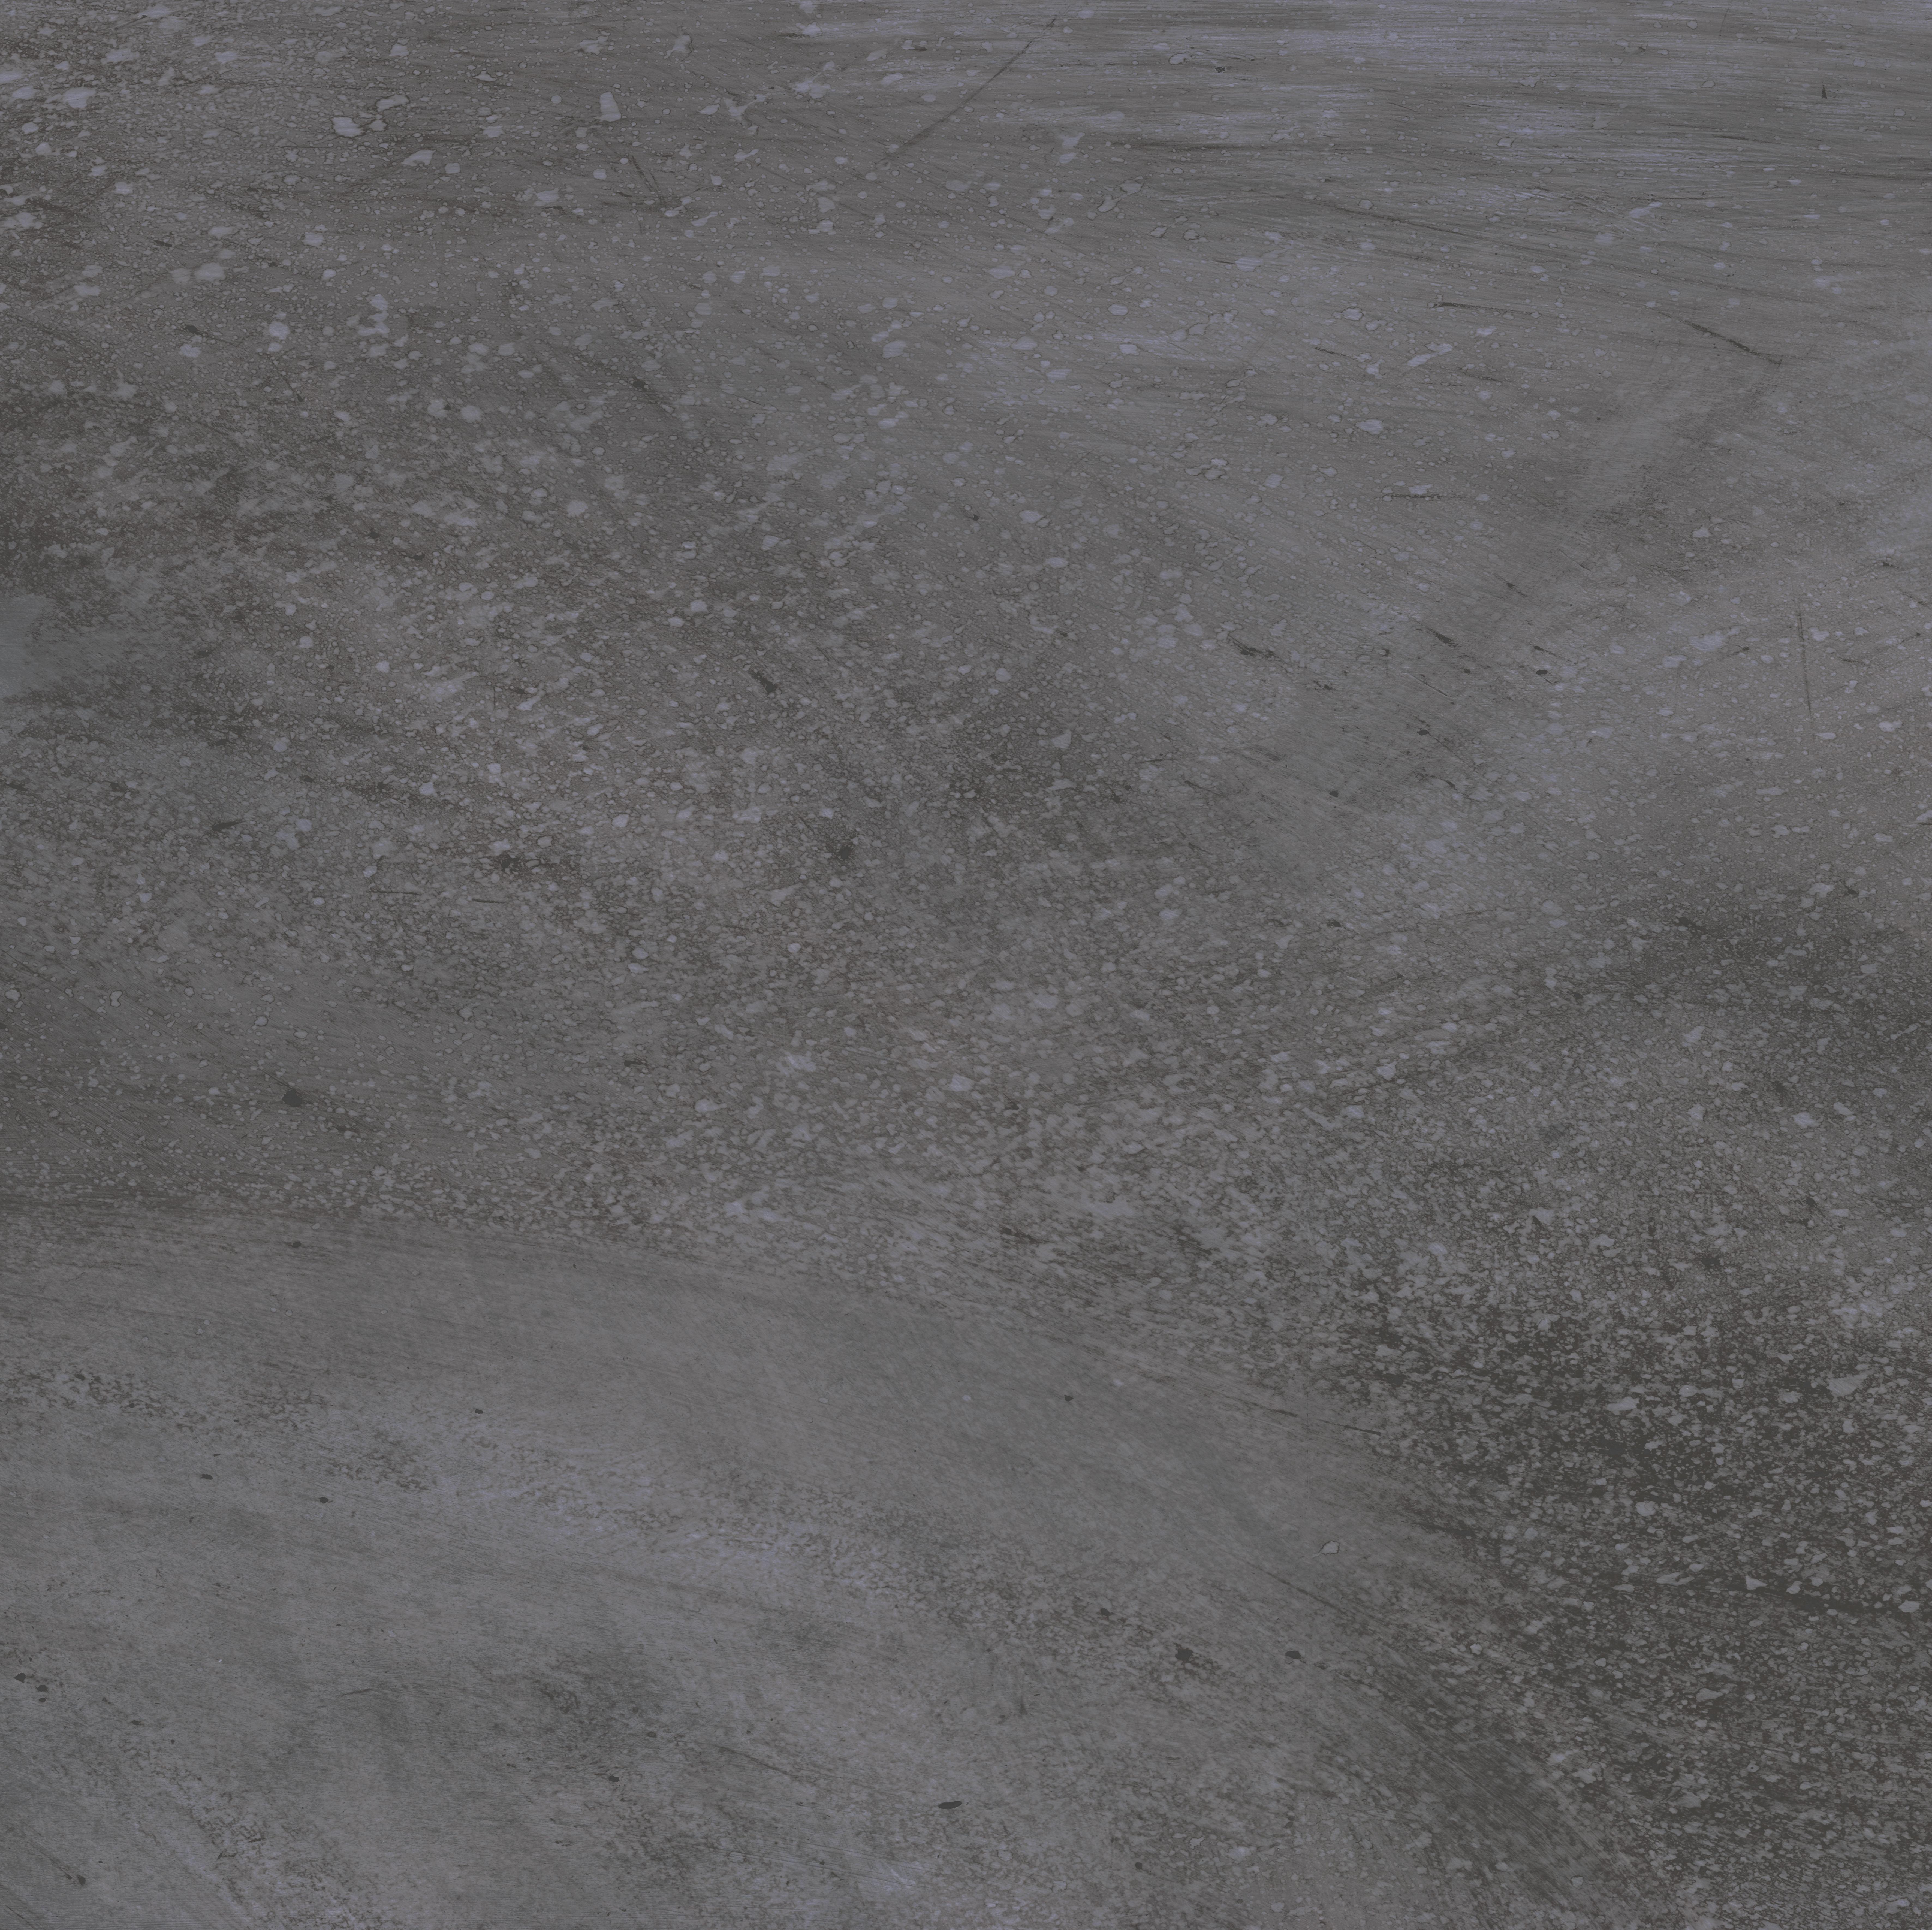 Richmond grey Керамогранит 02 60х60 richmond grey керамогранит 01 60х60